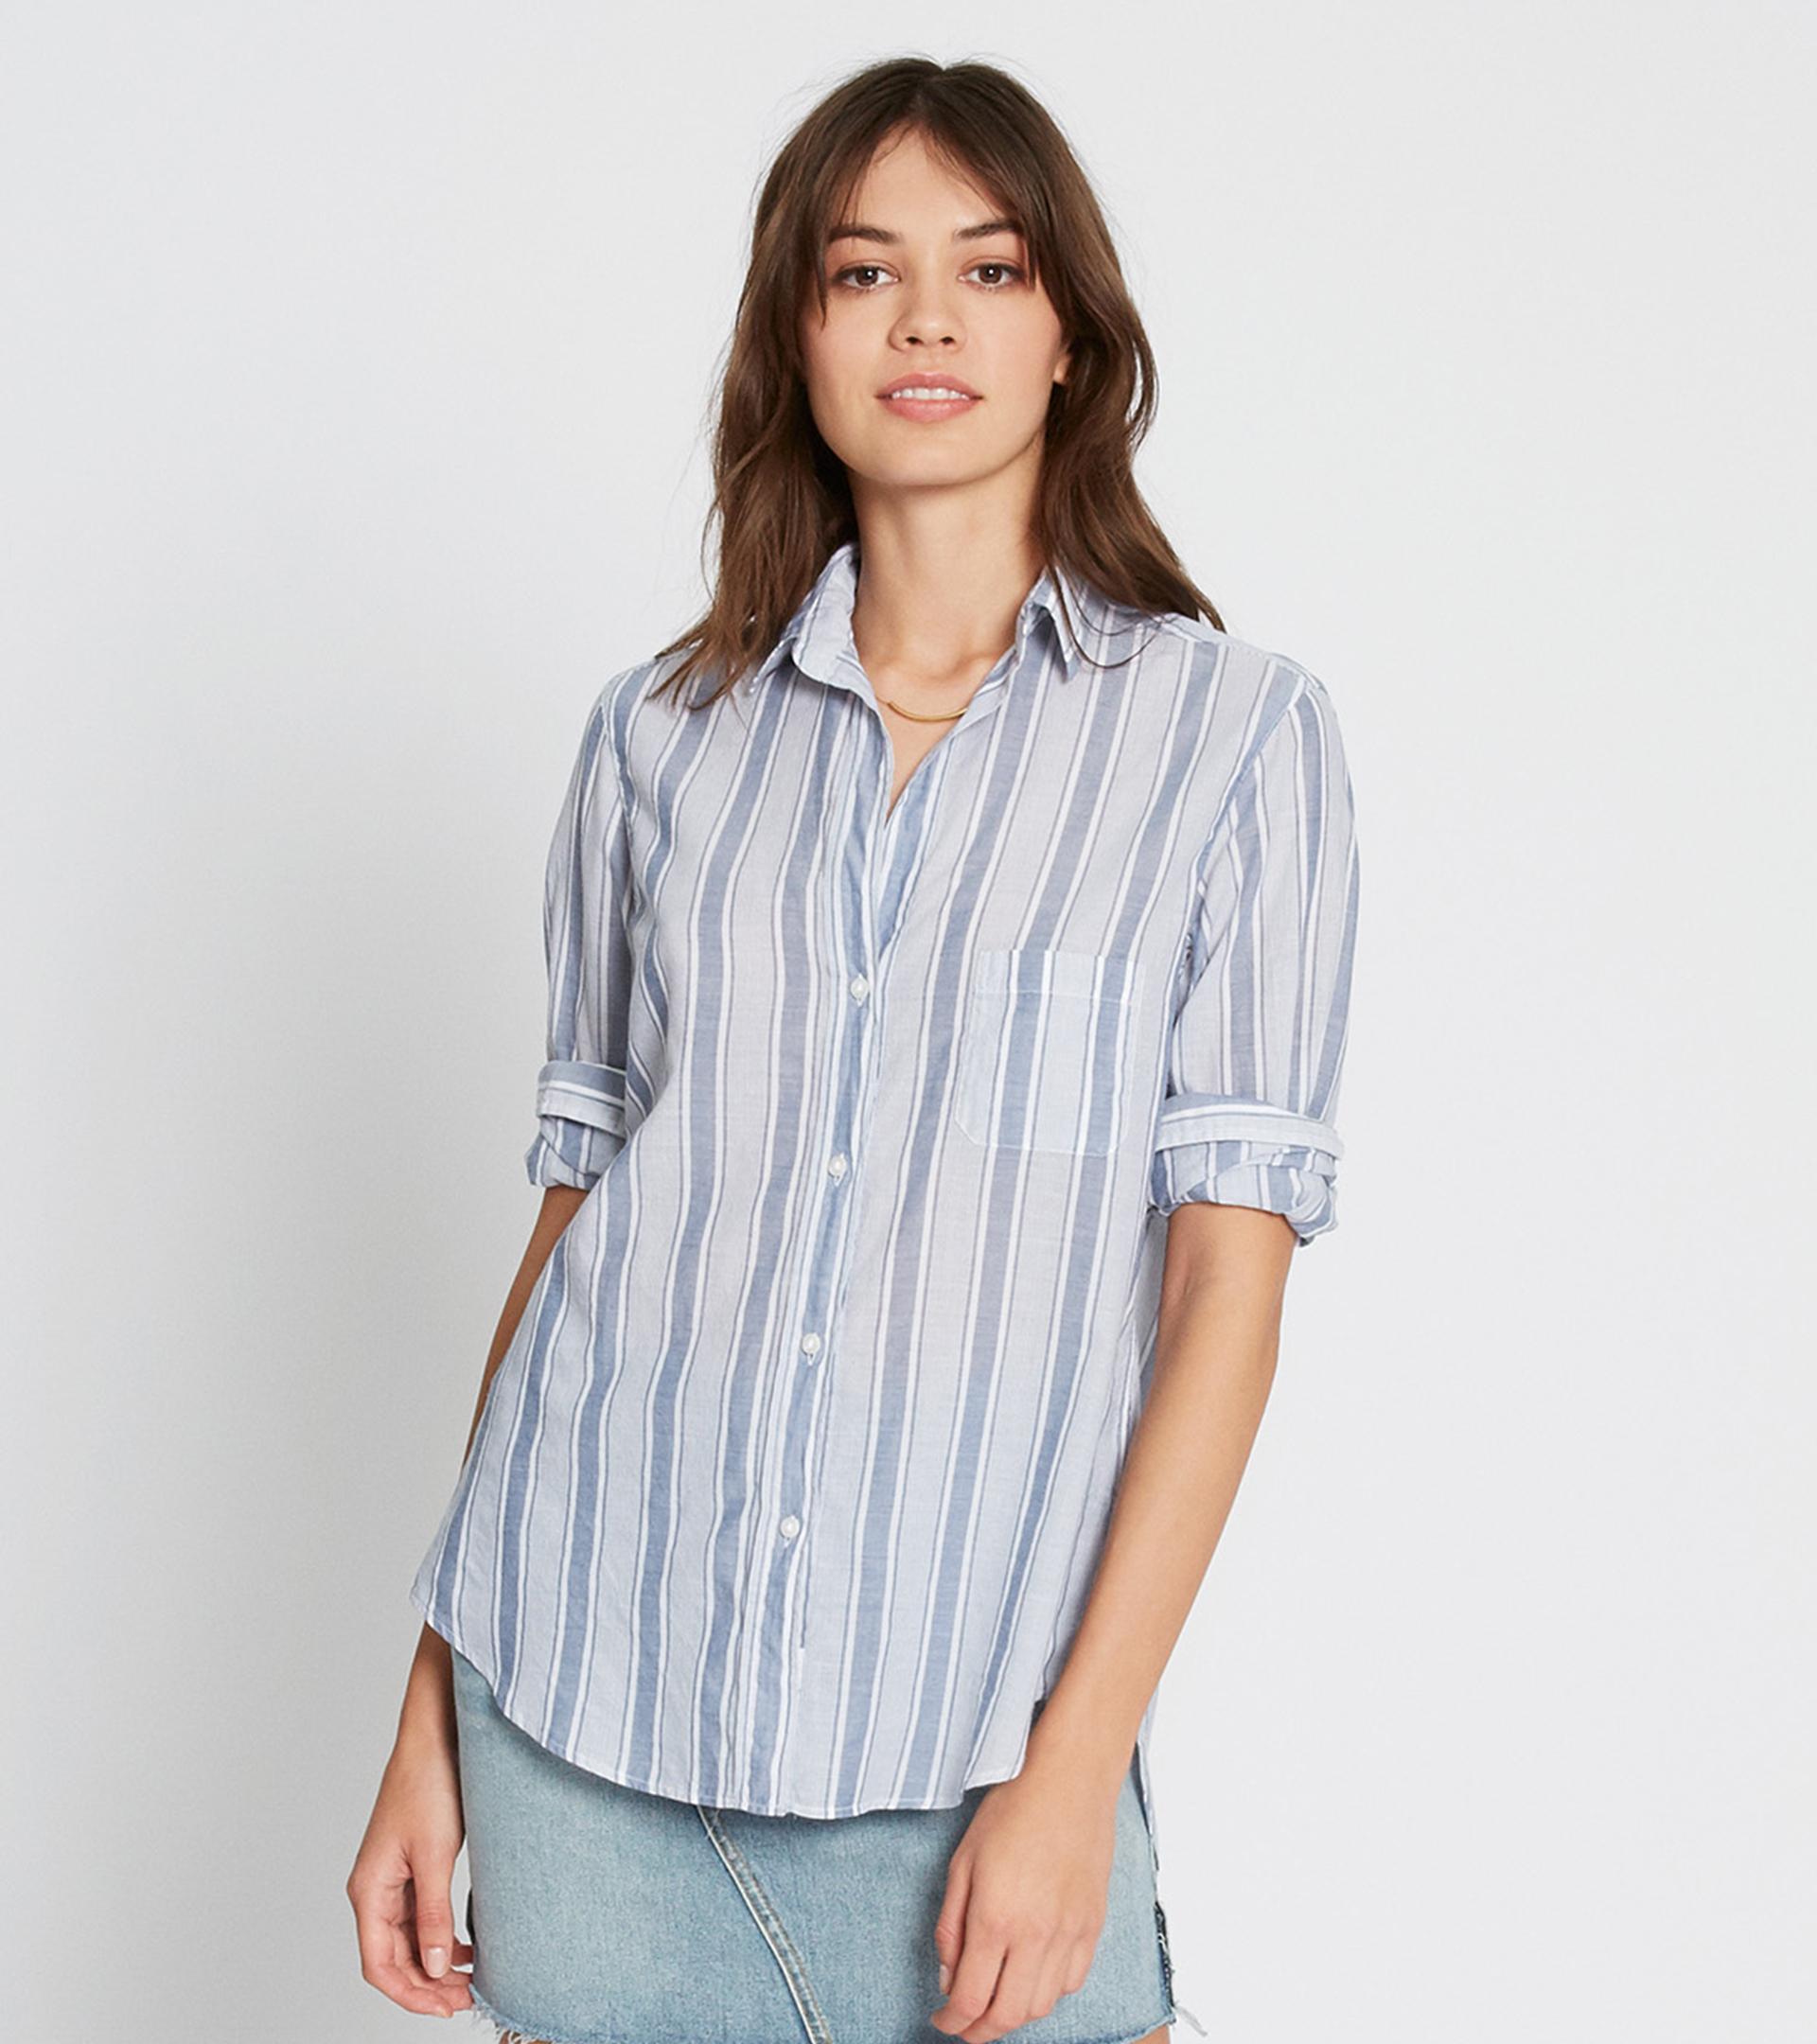 Image of The Hero Tissue Cotton Stripes Sale